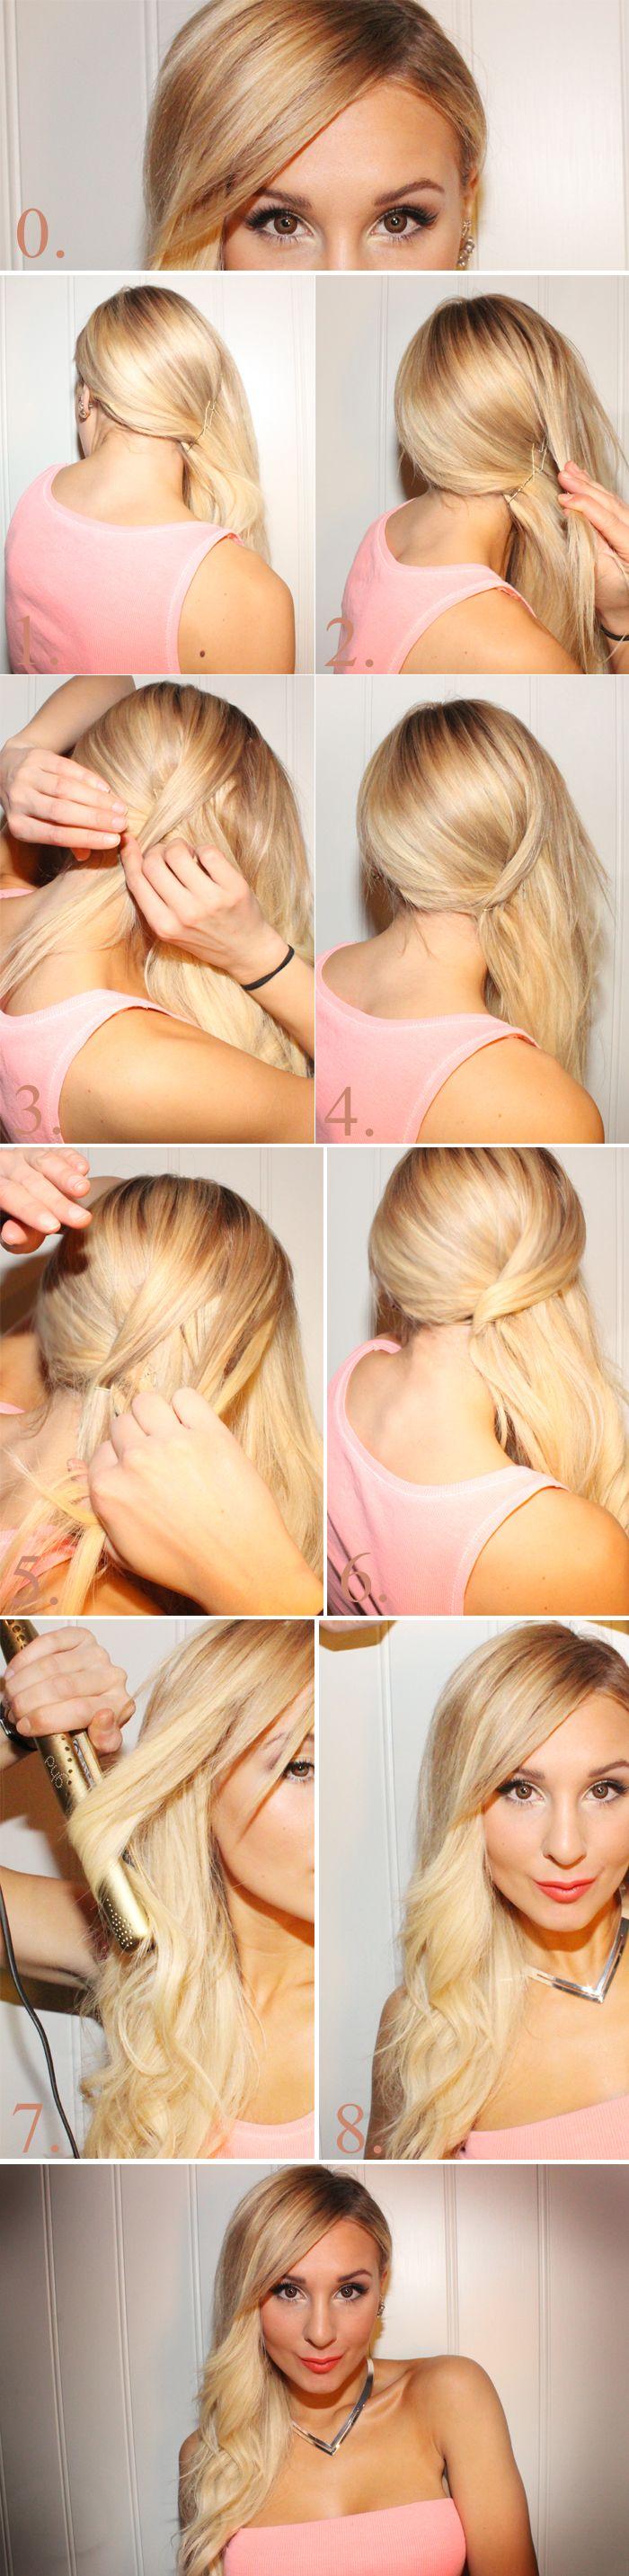 Get the look – Glamorous side curls a la Jessica Alba